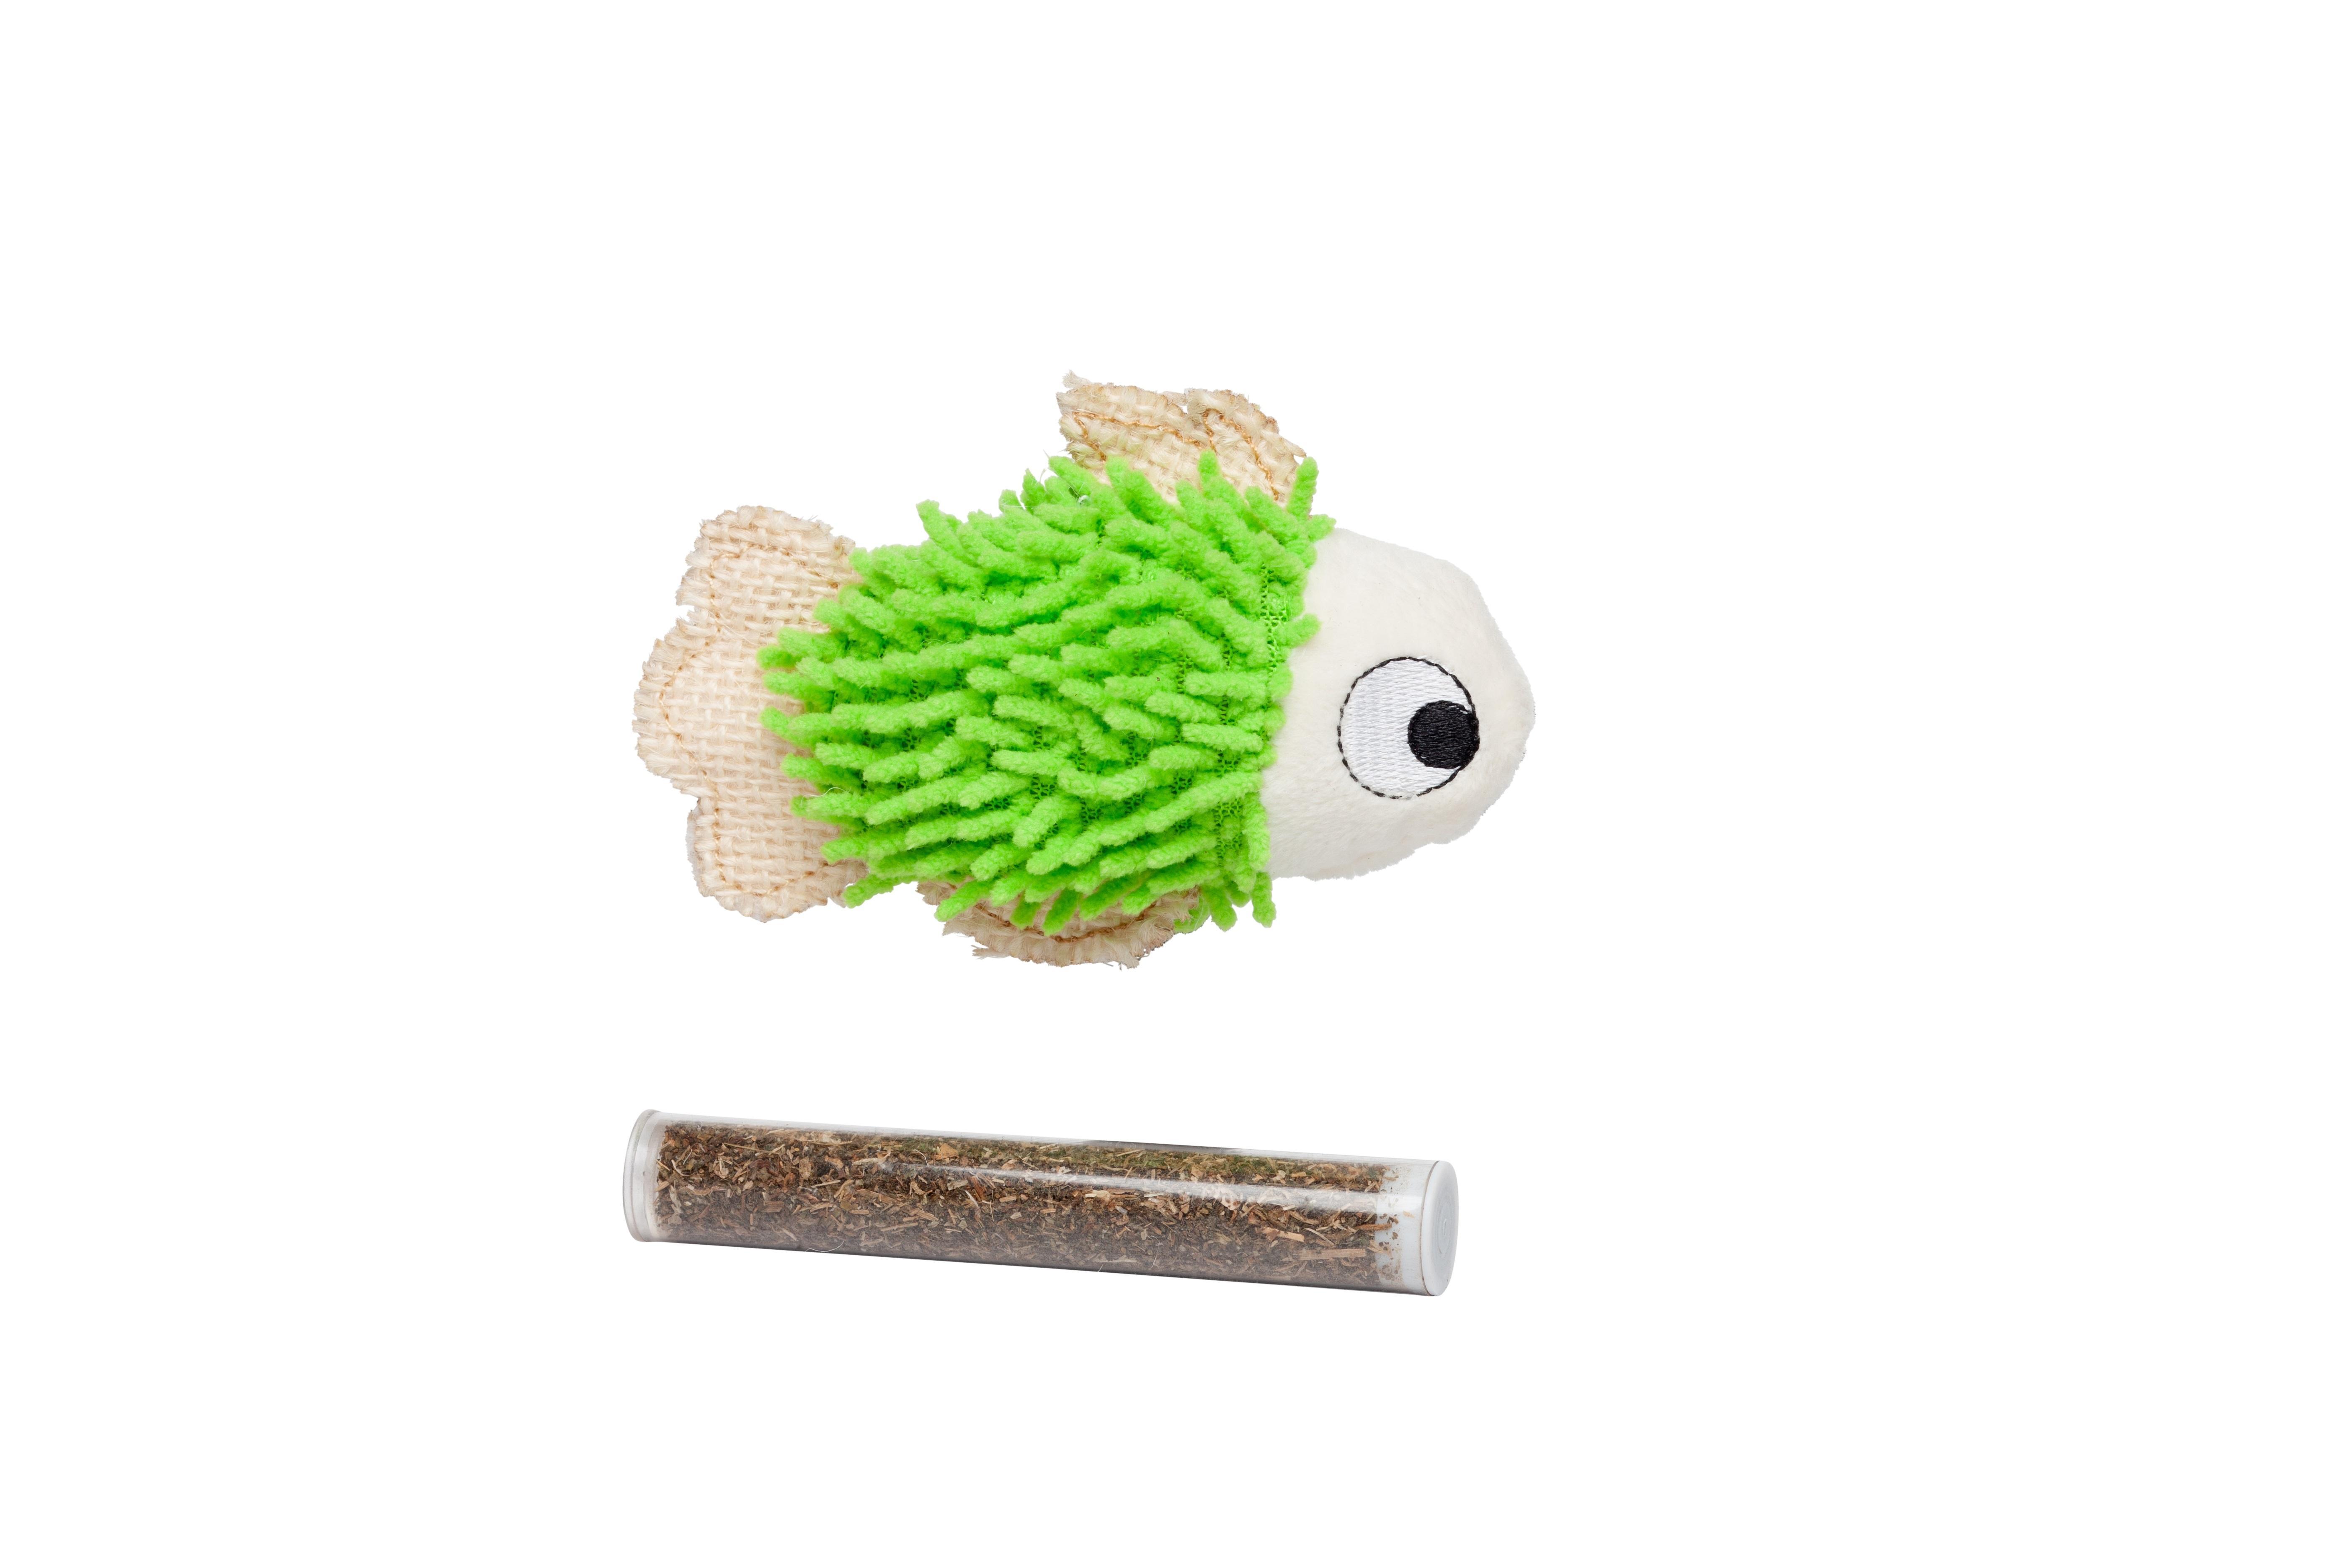 Bud'z Fish Catnip Cat Toy, Green, 11.43-cm